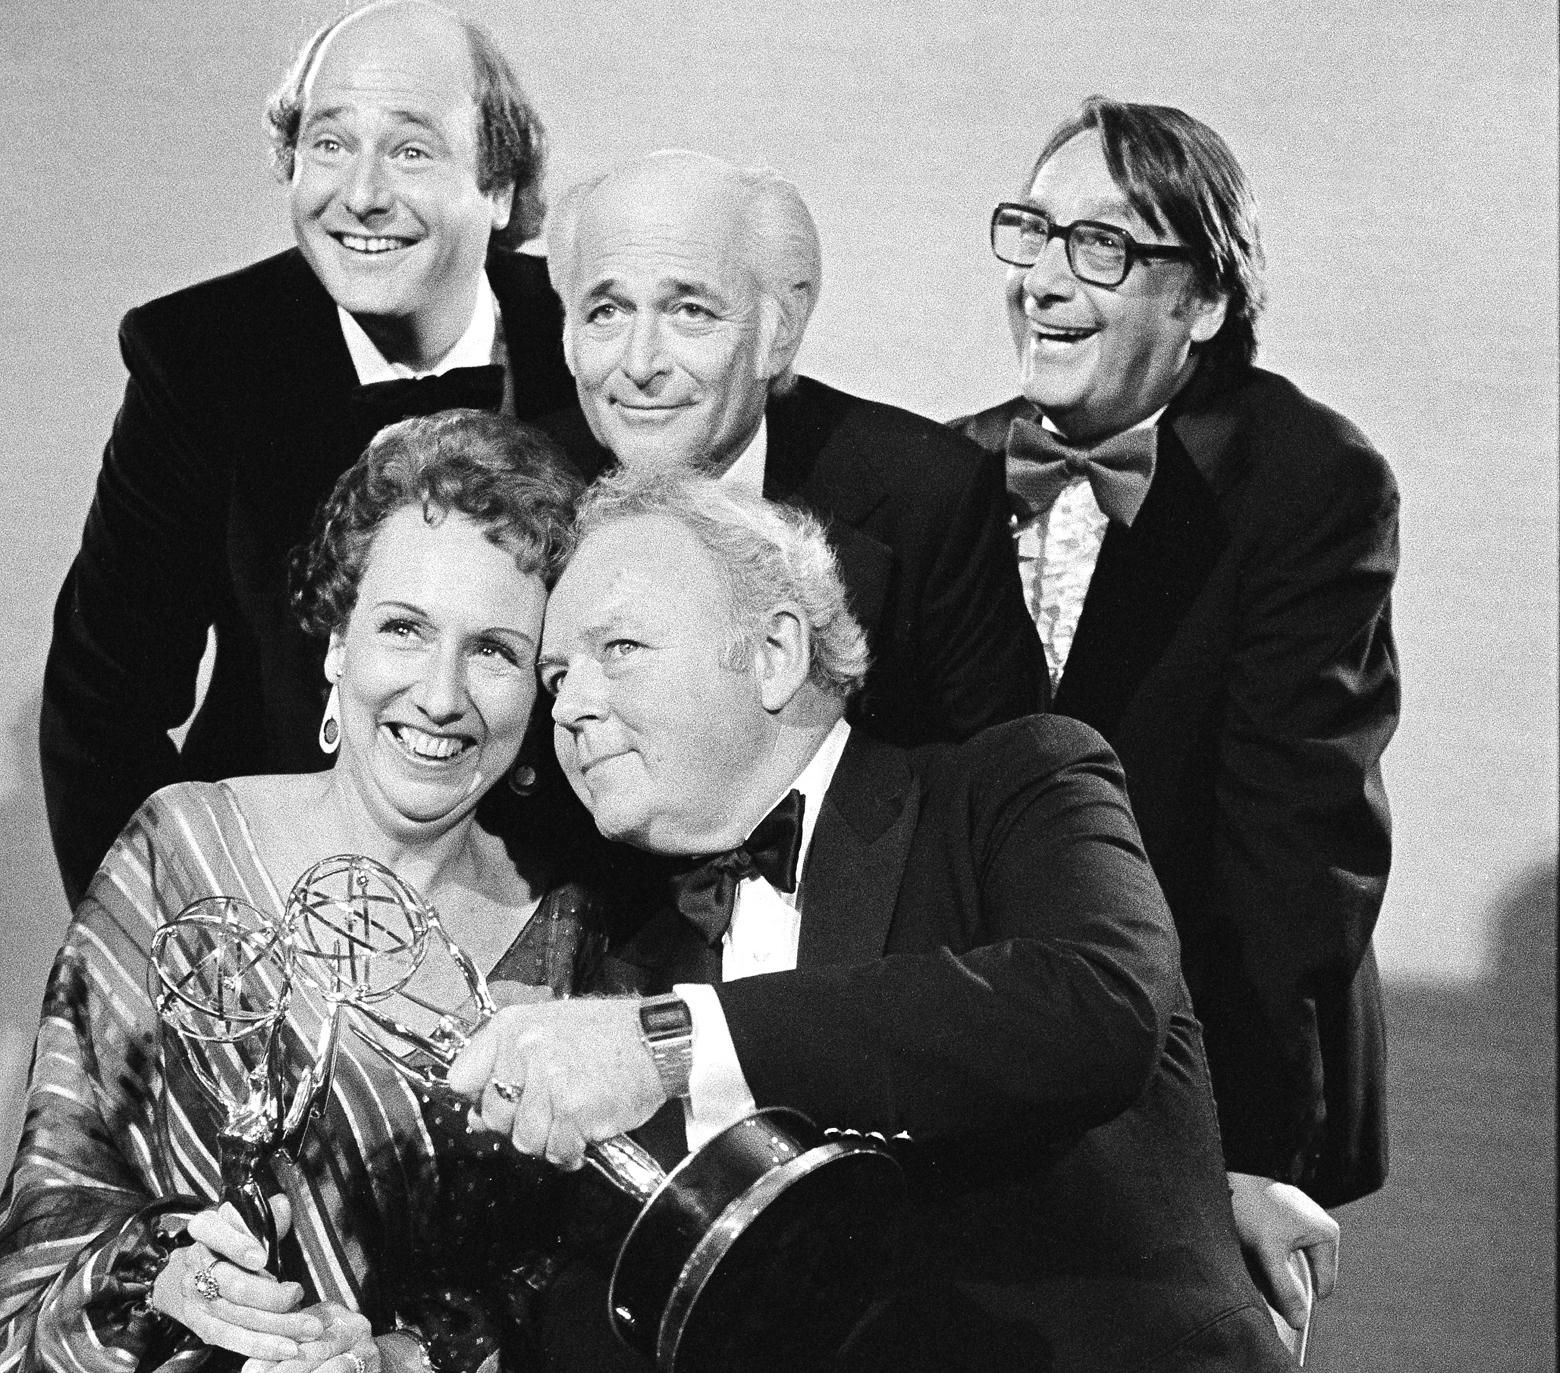 King Lear: TV legend shares his sitcom secrets in new memoir